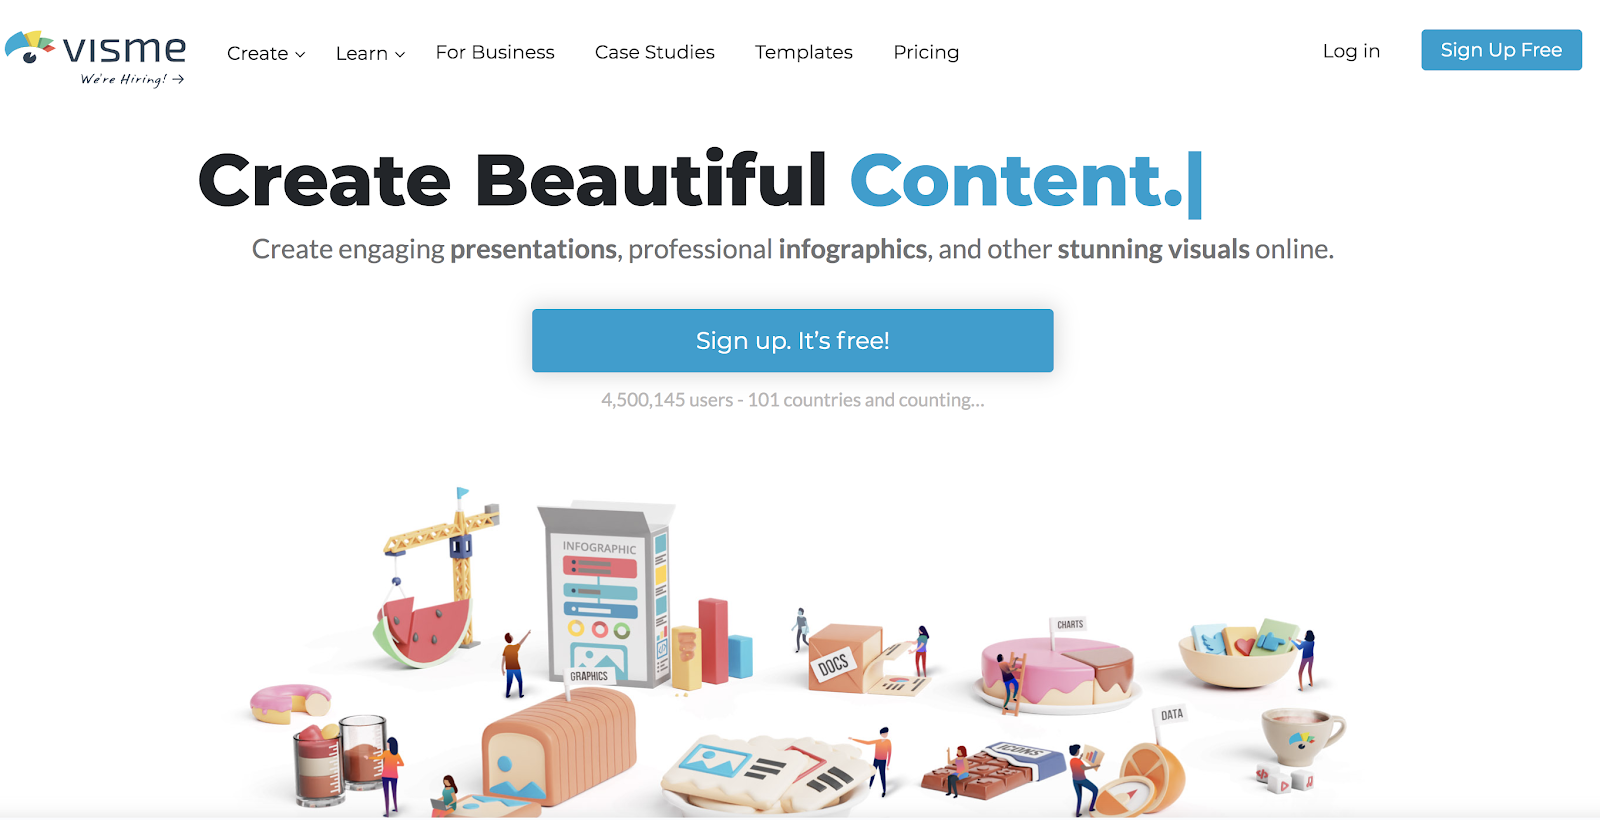 Visme Homepage Screenshot (eBook Designer Tool)